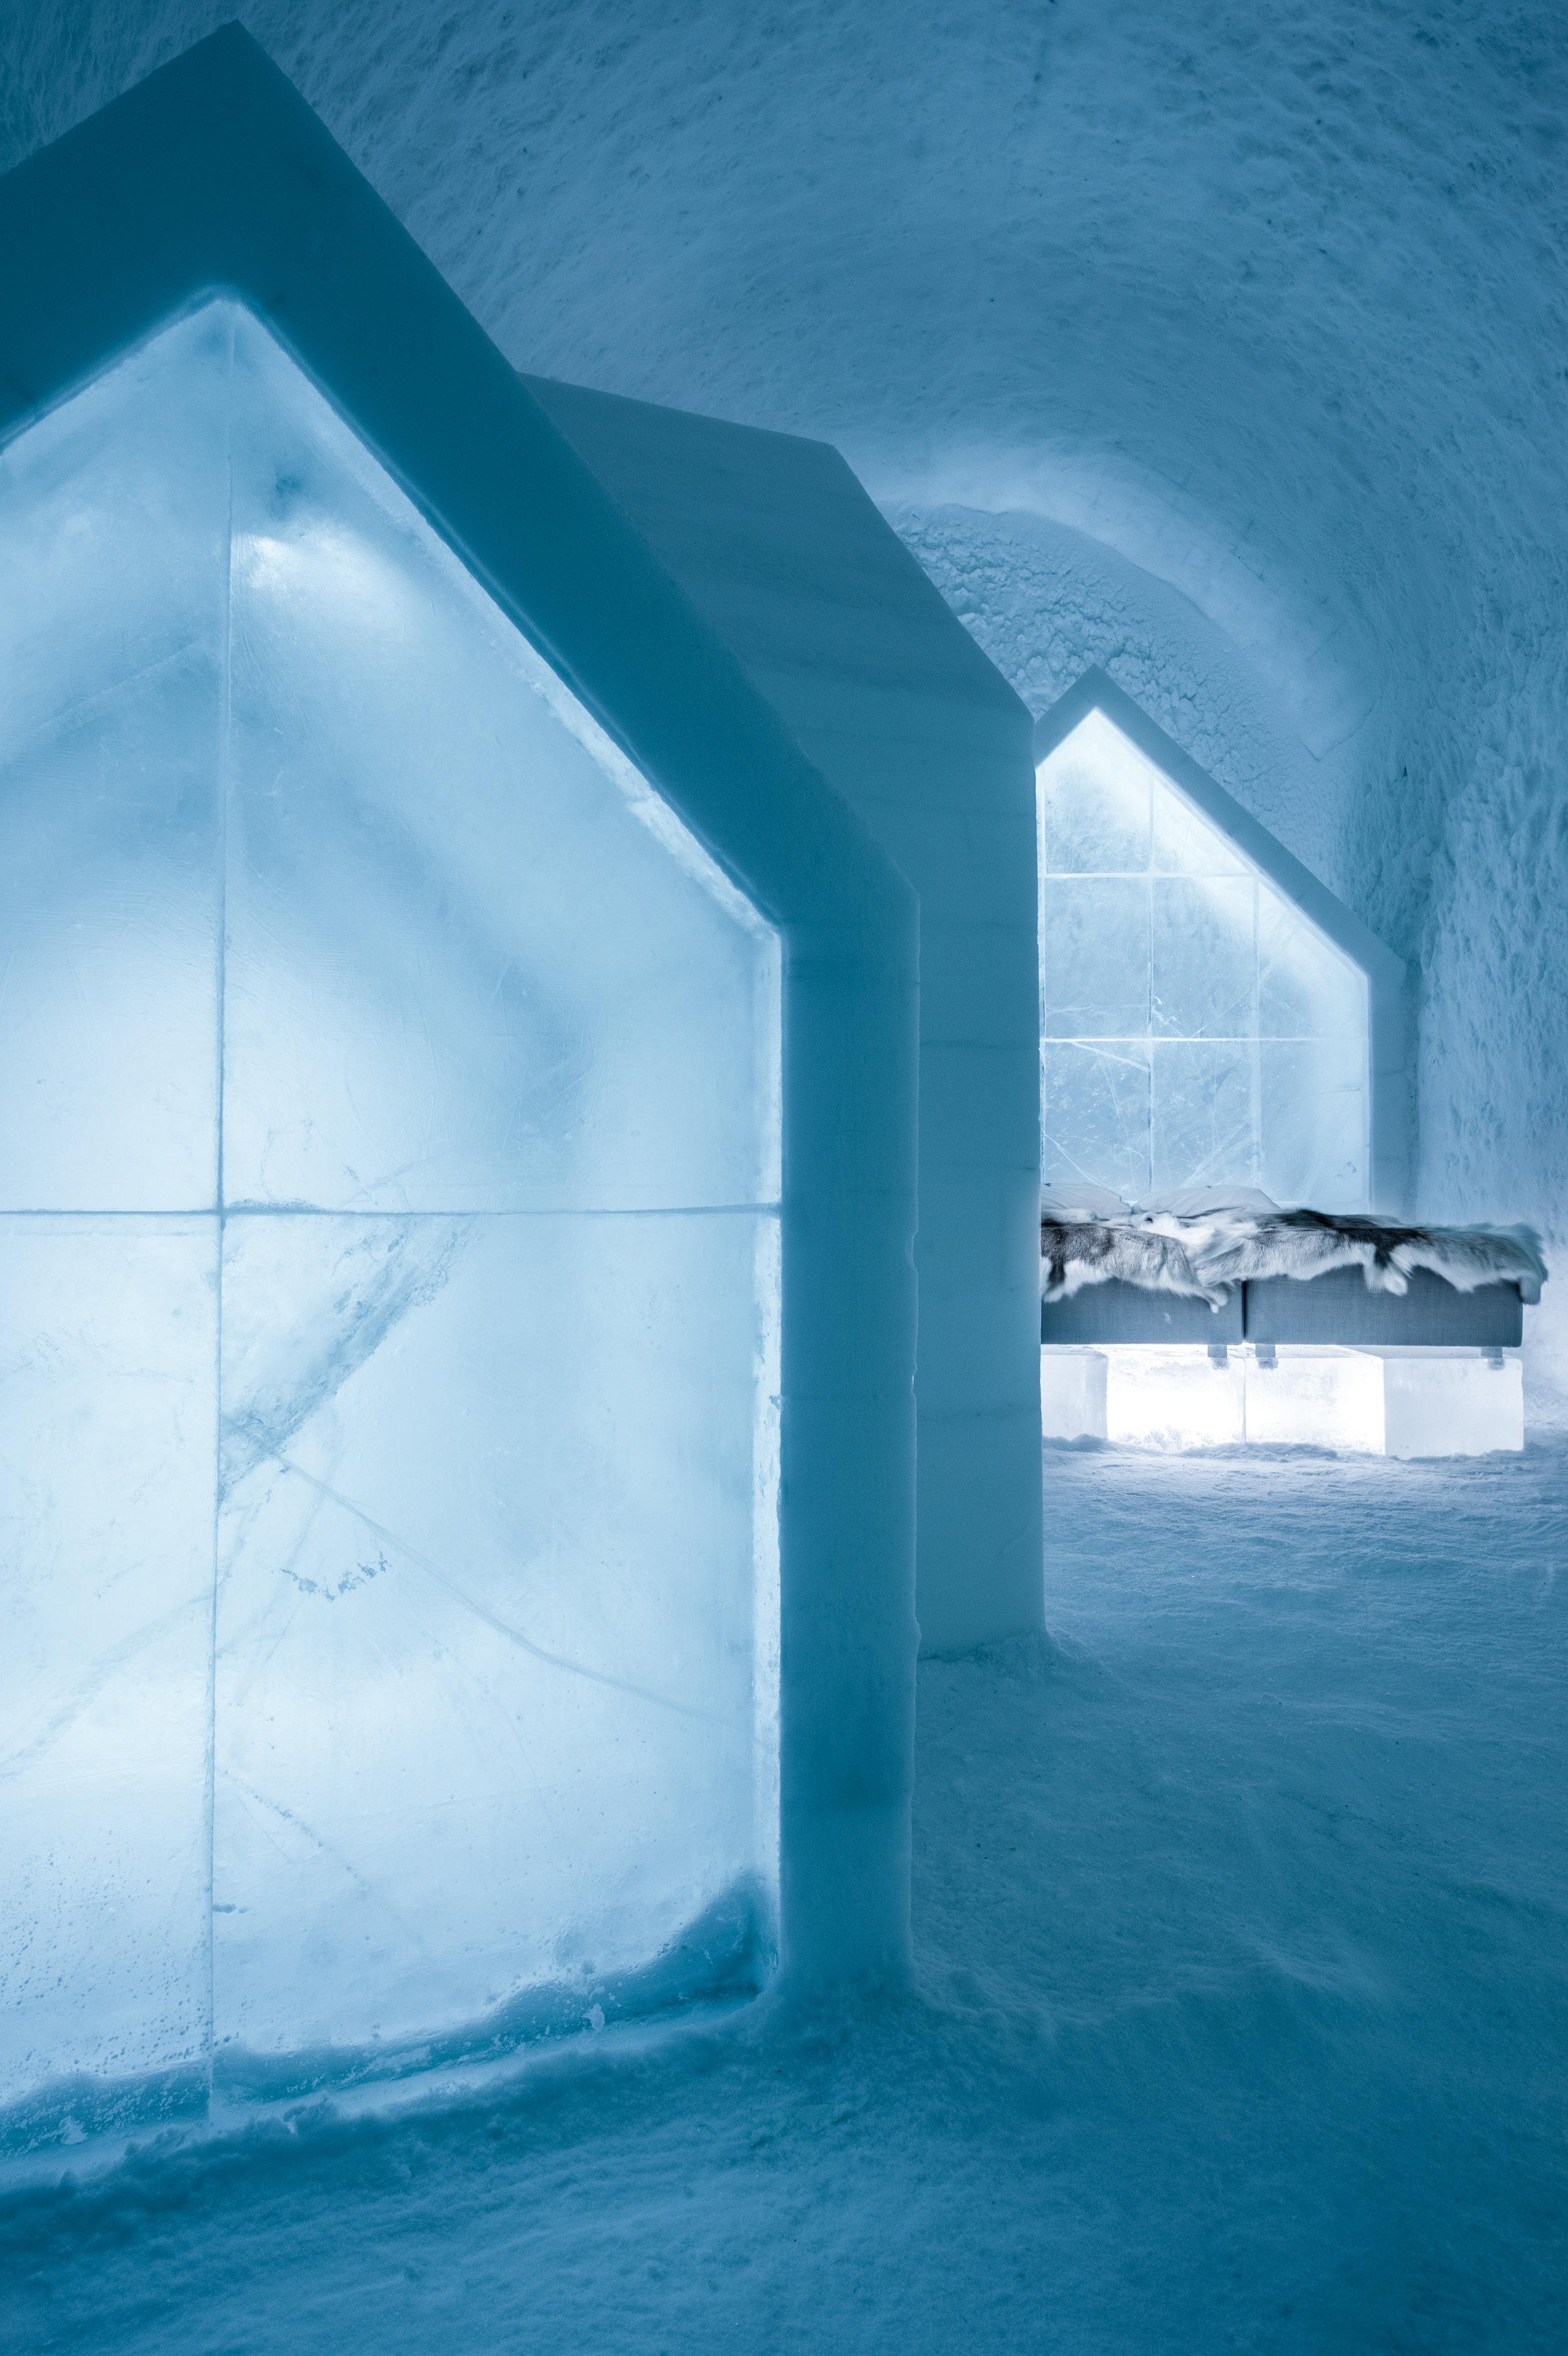 Johan & Nina Kauppi, Blue Houses--ICEHOTEL 365 photo by - Asaf Kliger (3 of 4) (1 of 1).jpg